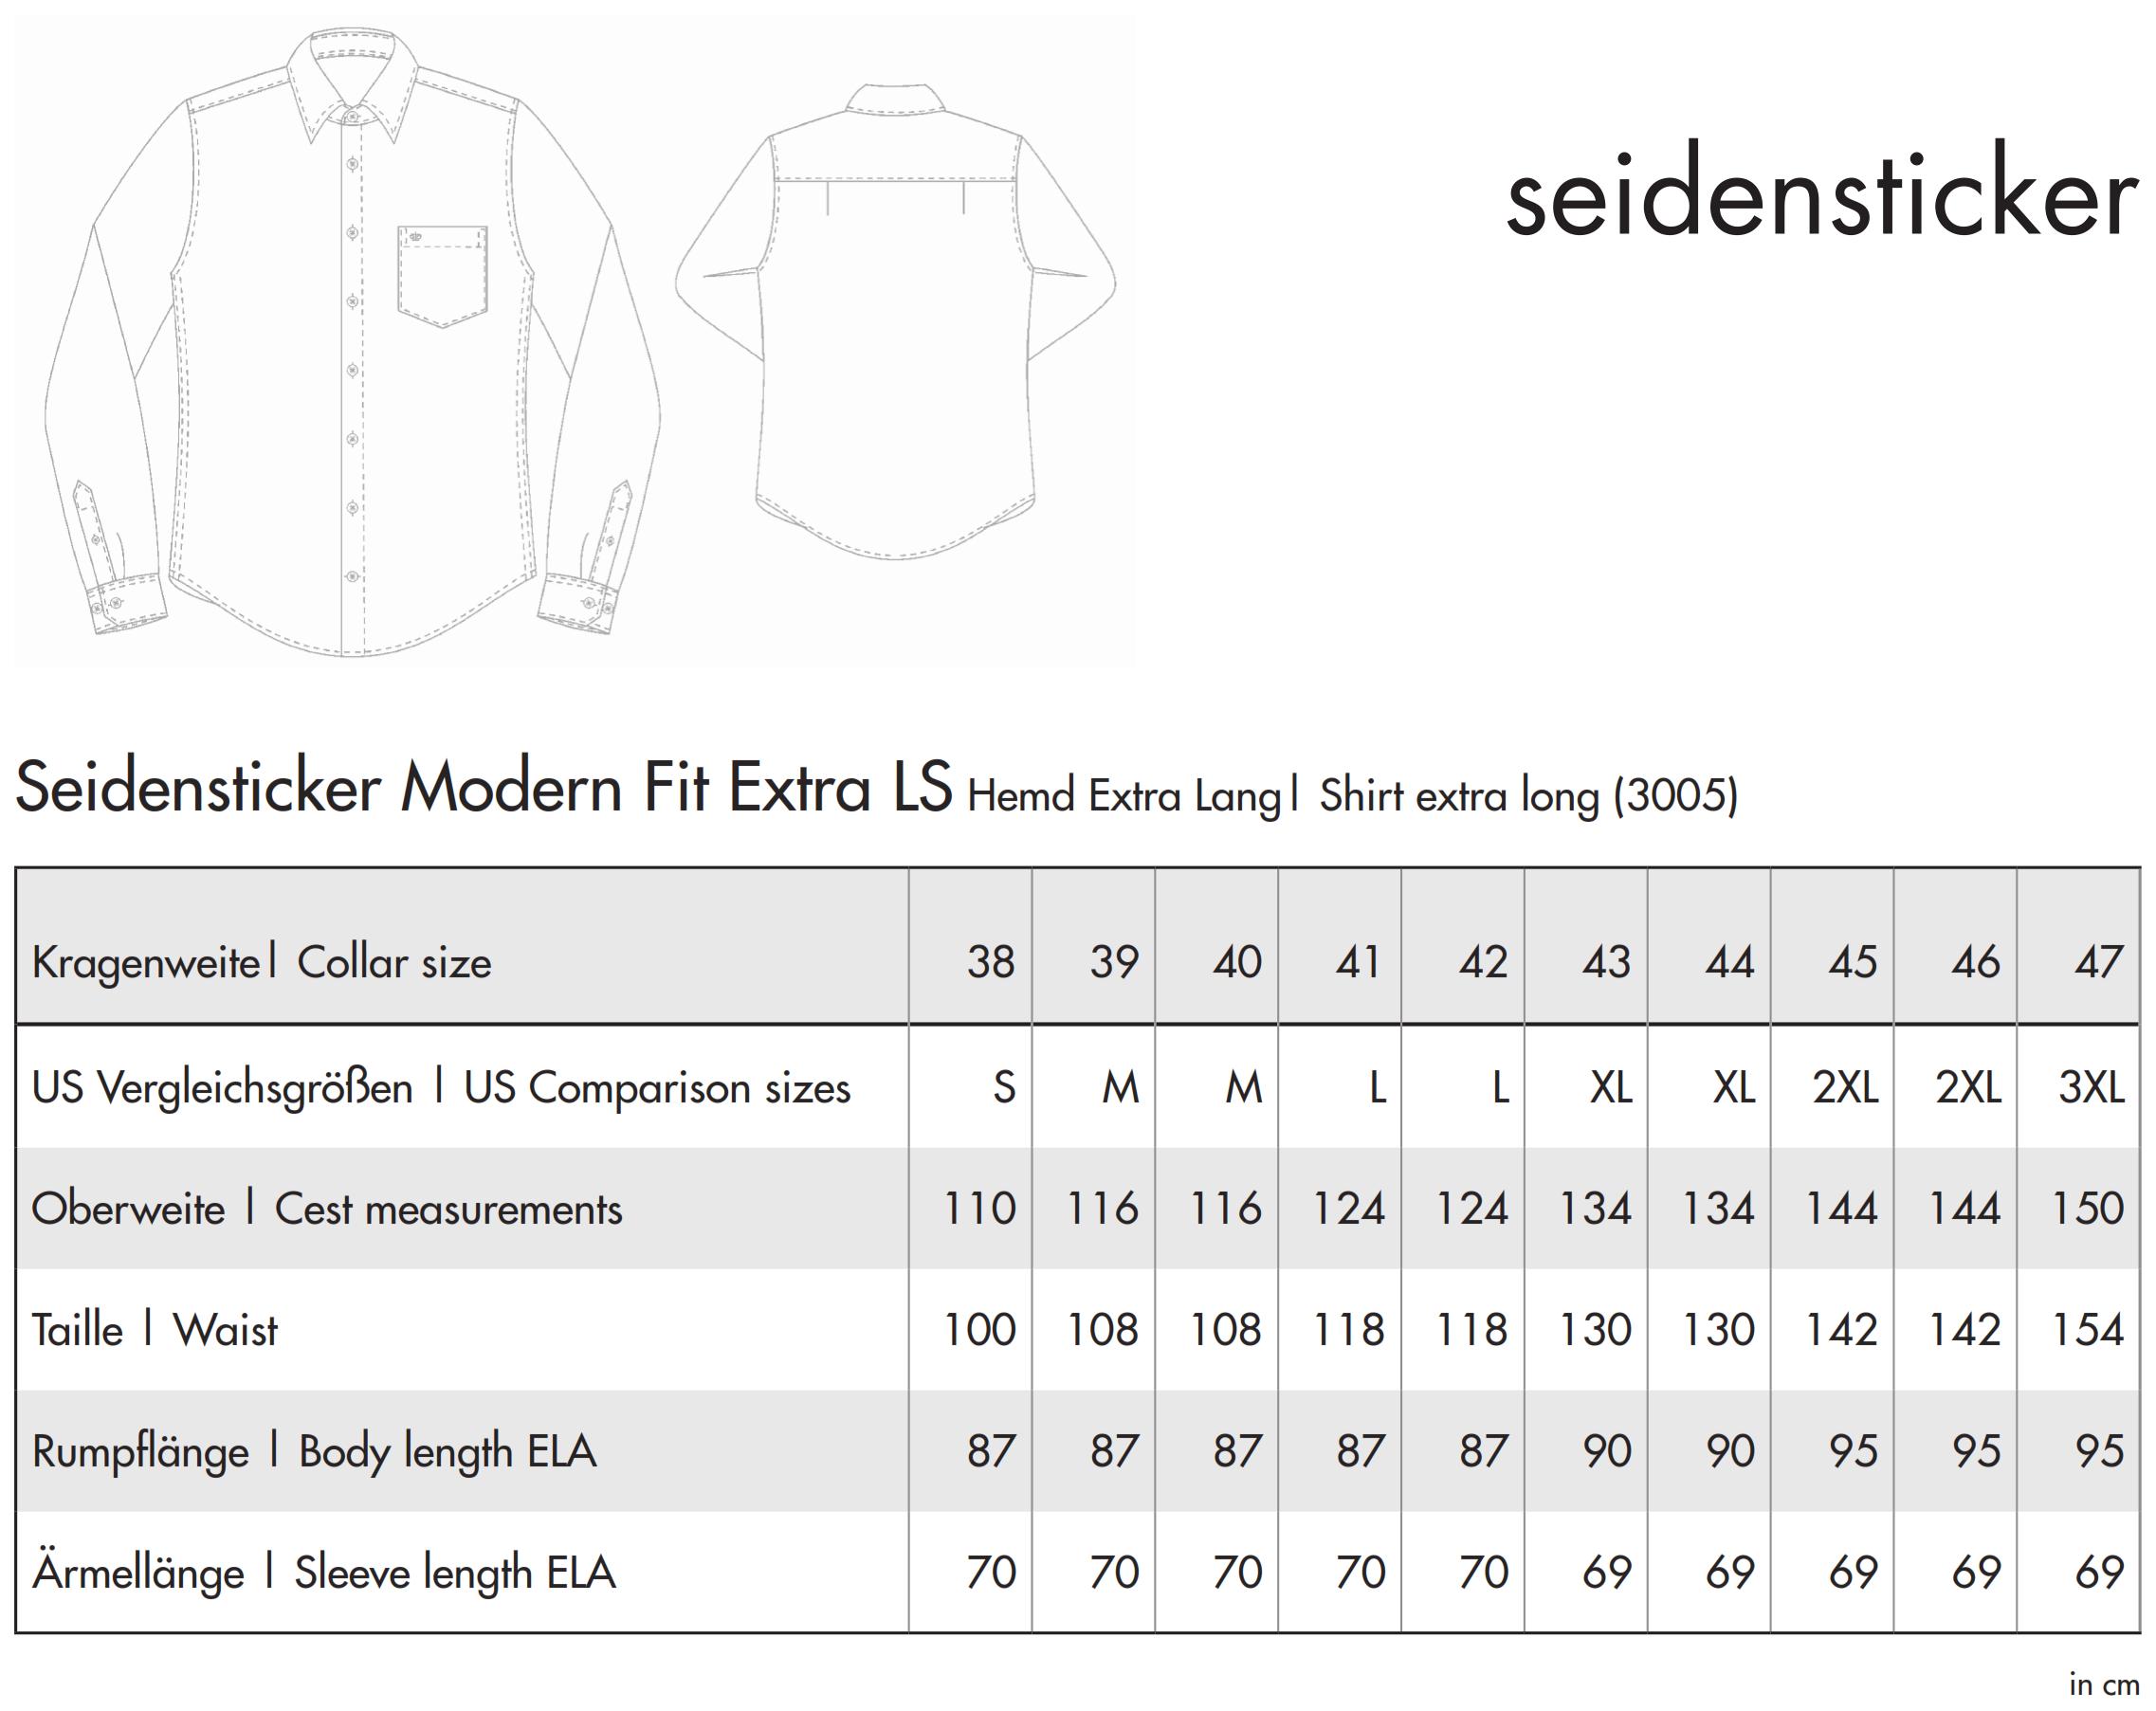 Seidensticker: Splendesto Hemd Extra Lang 3005